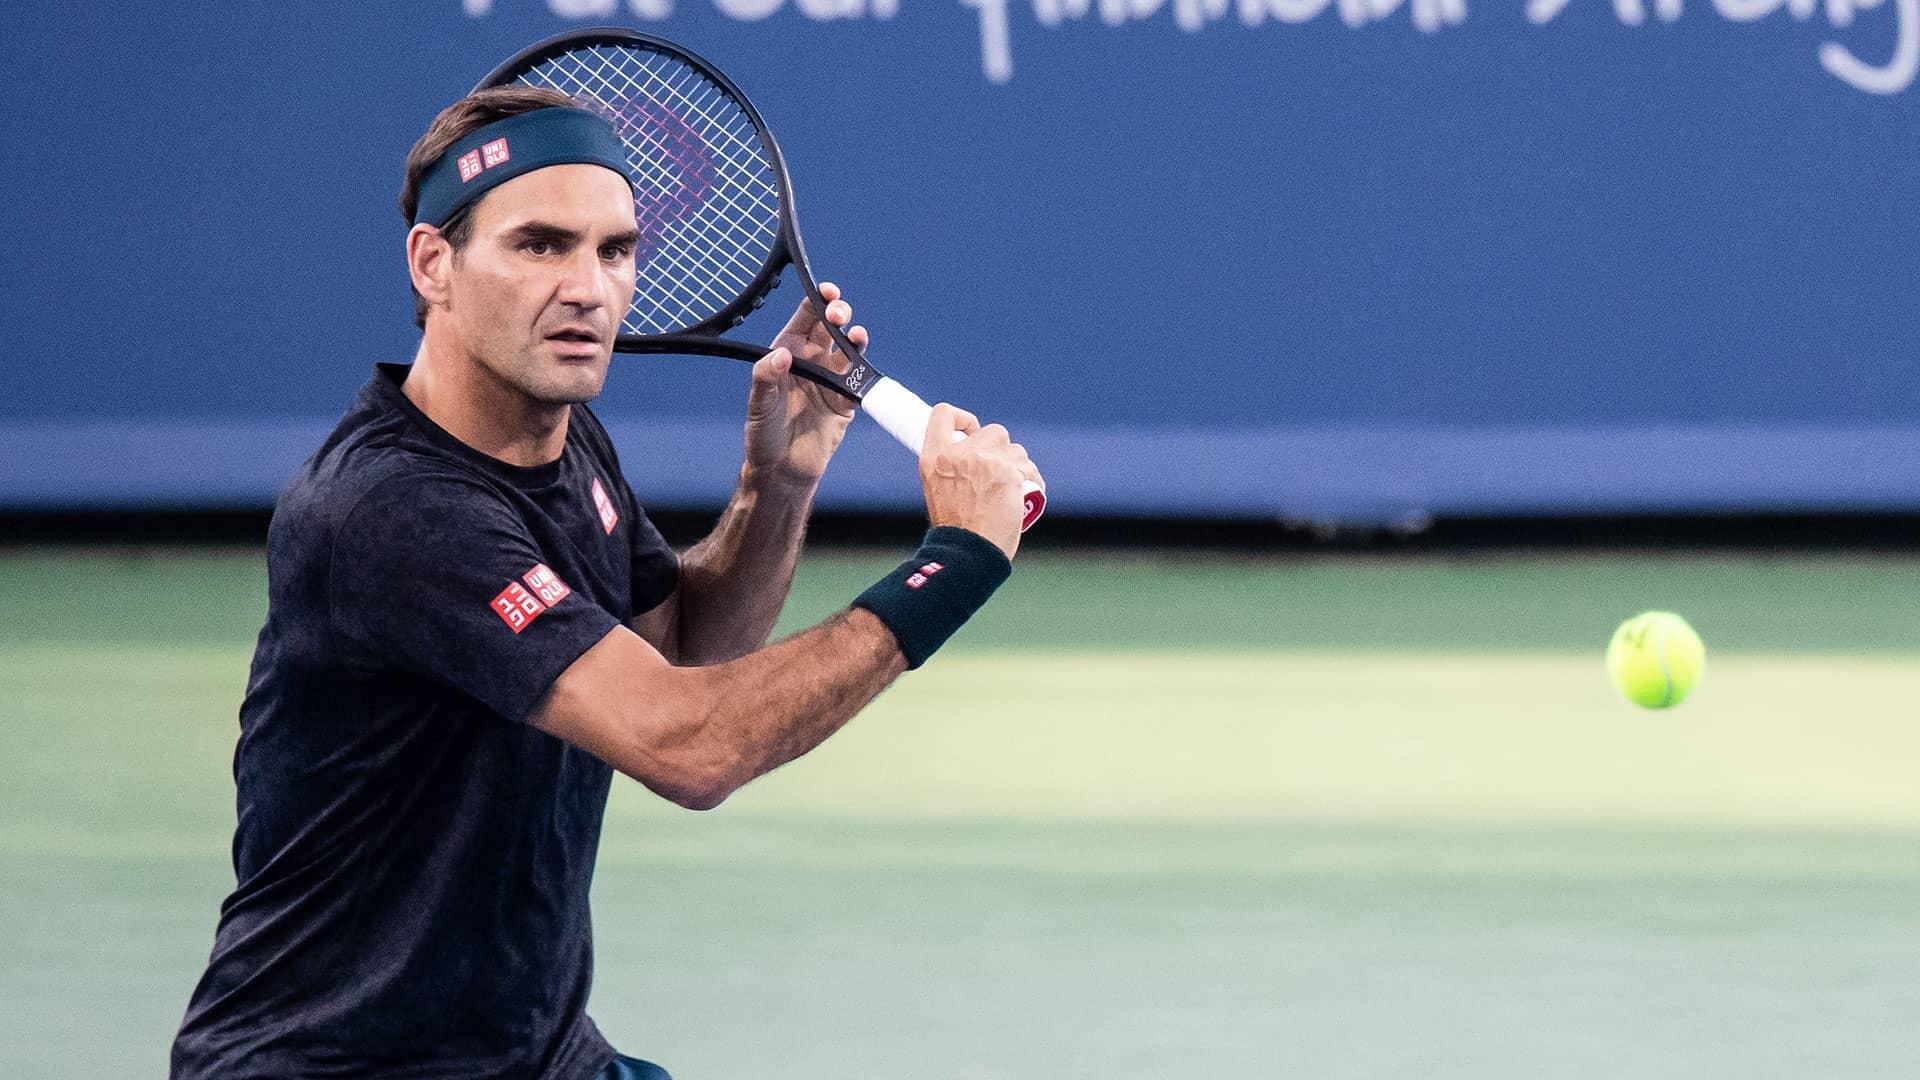 Federer, Djokovic Lead Cincinnati Play Tuesday